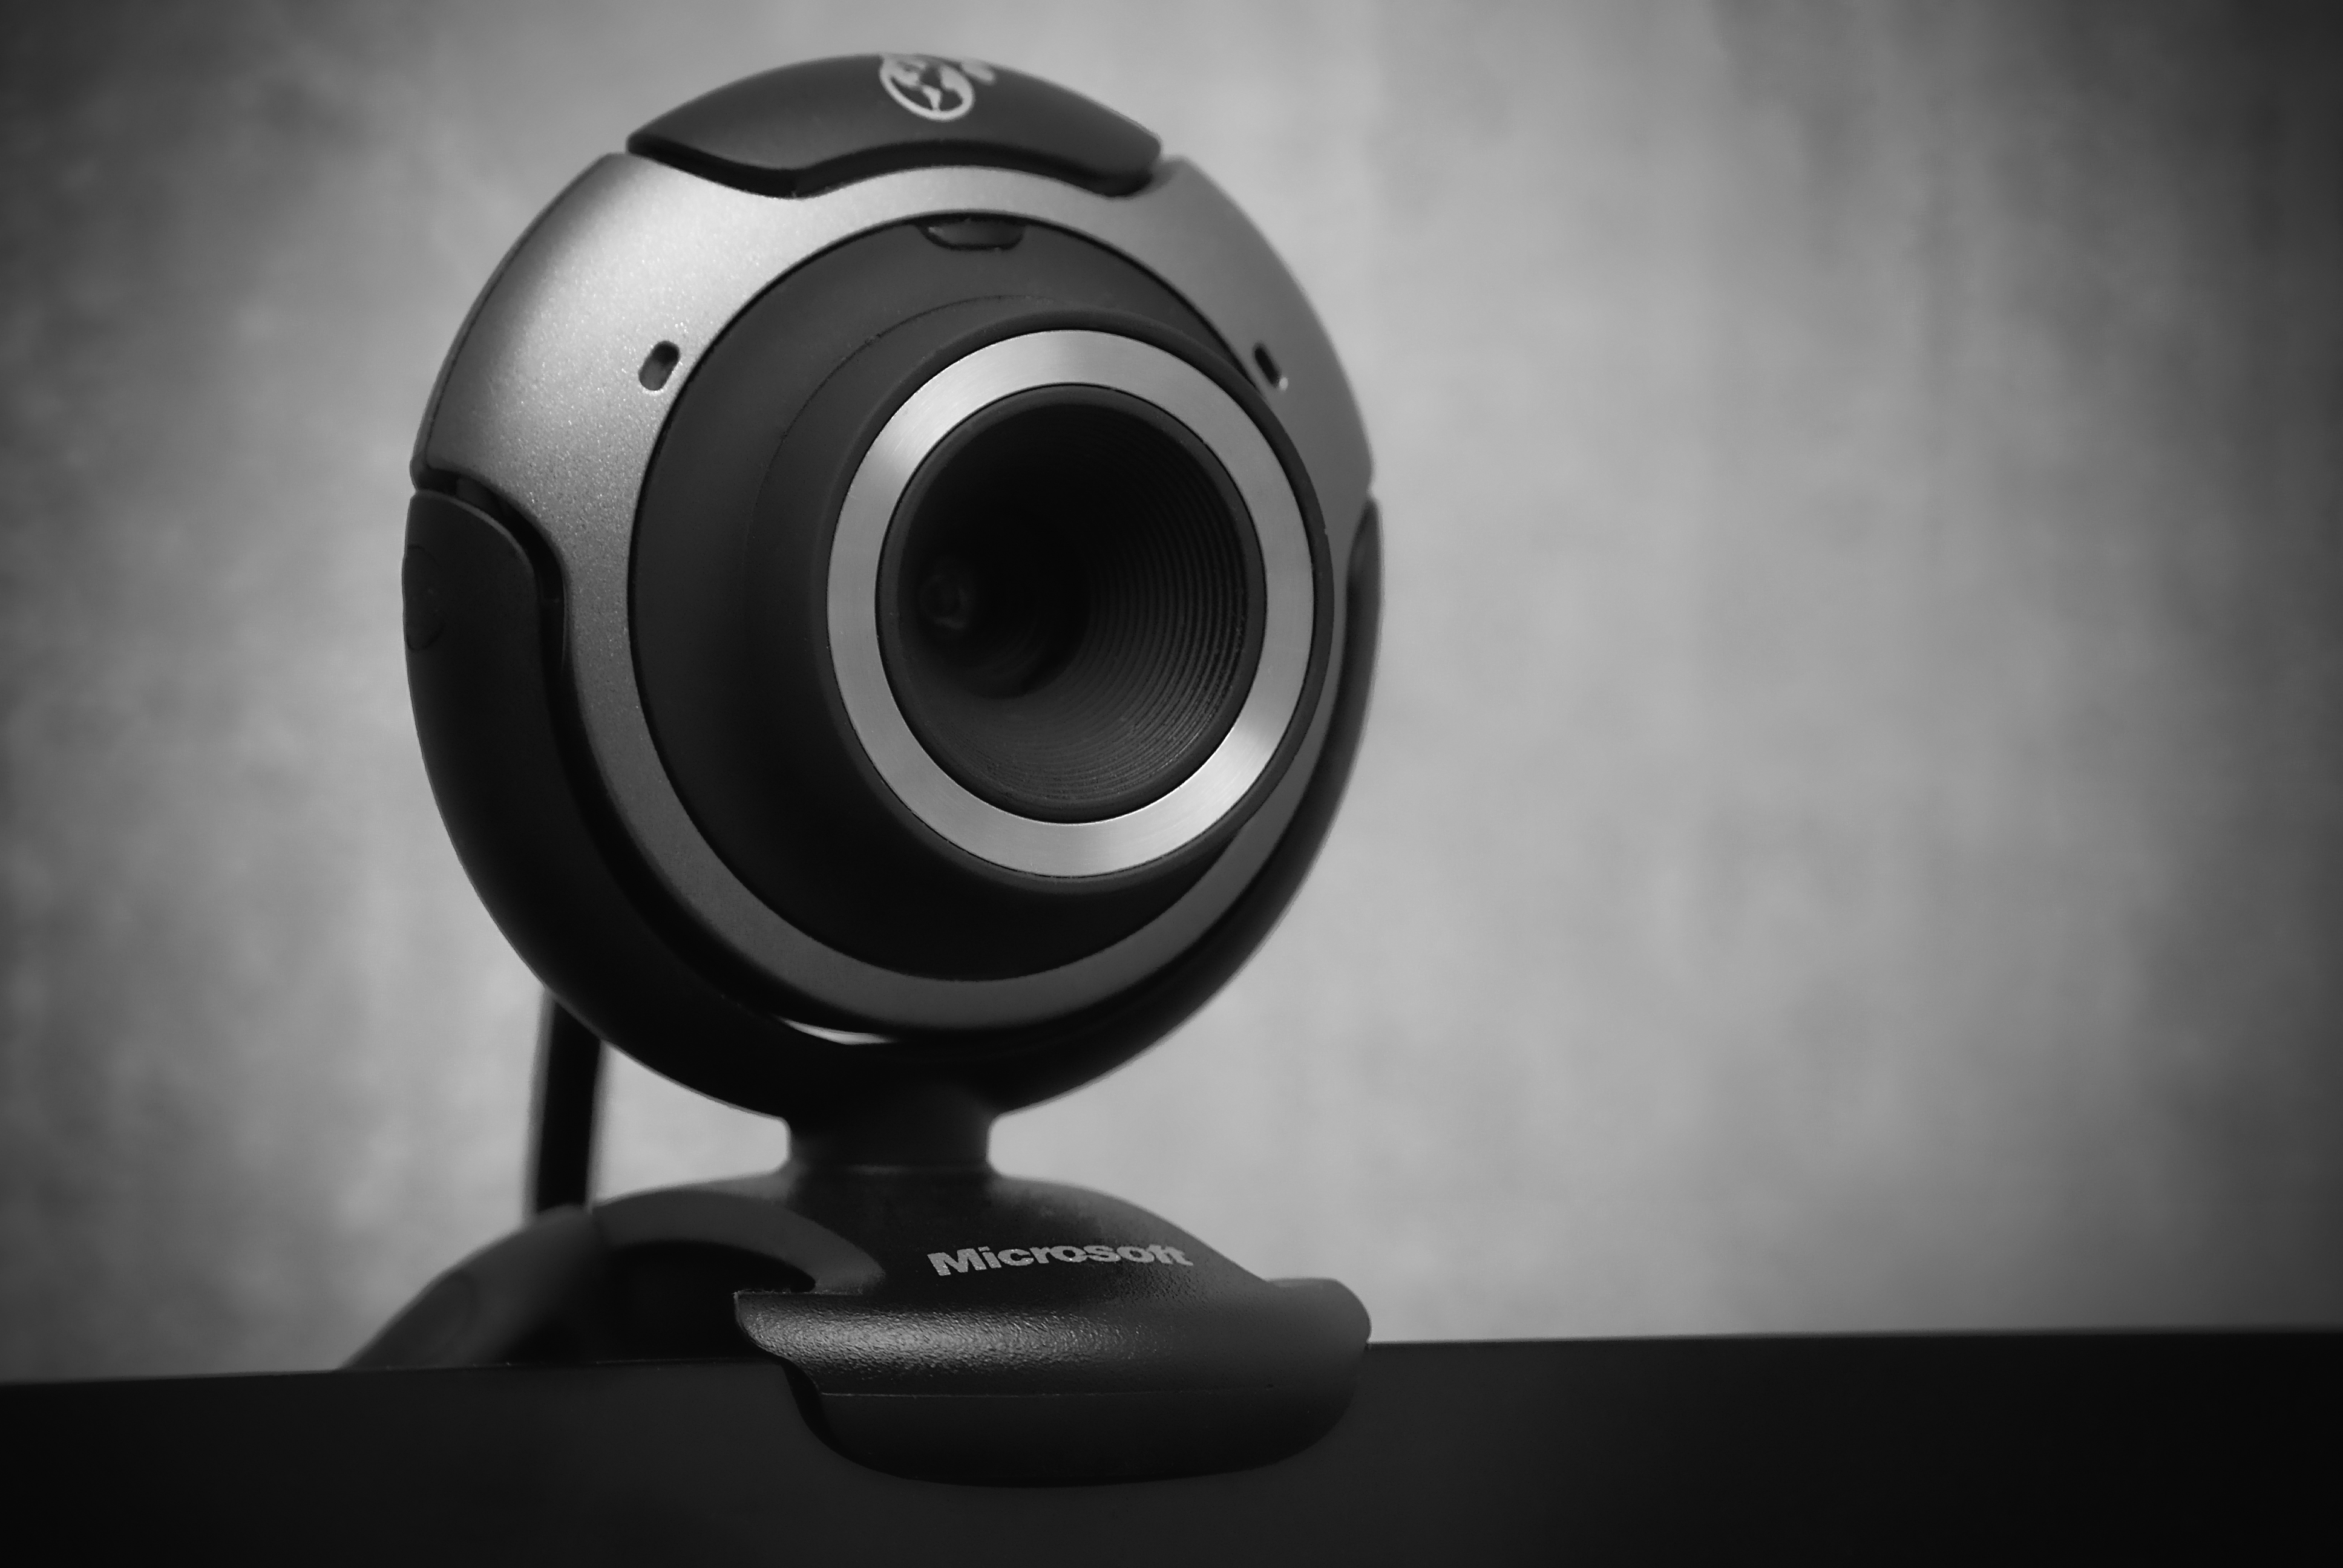 A webcam.